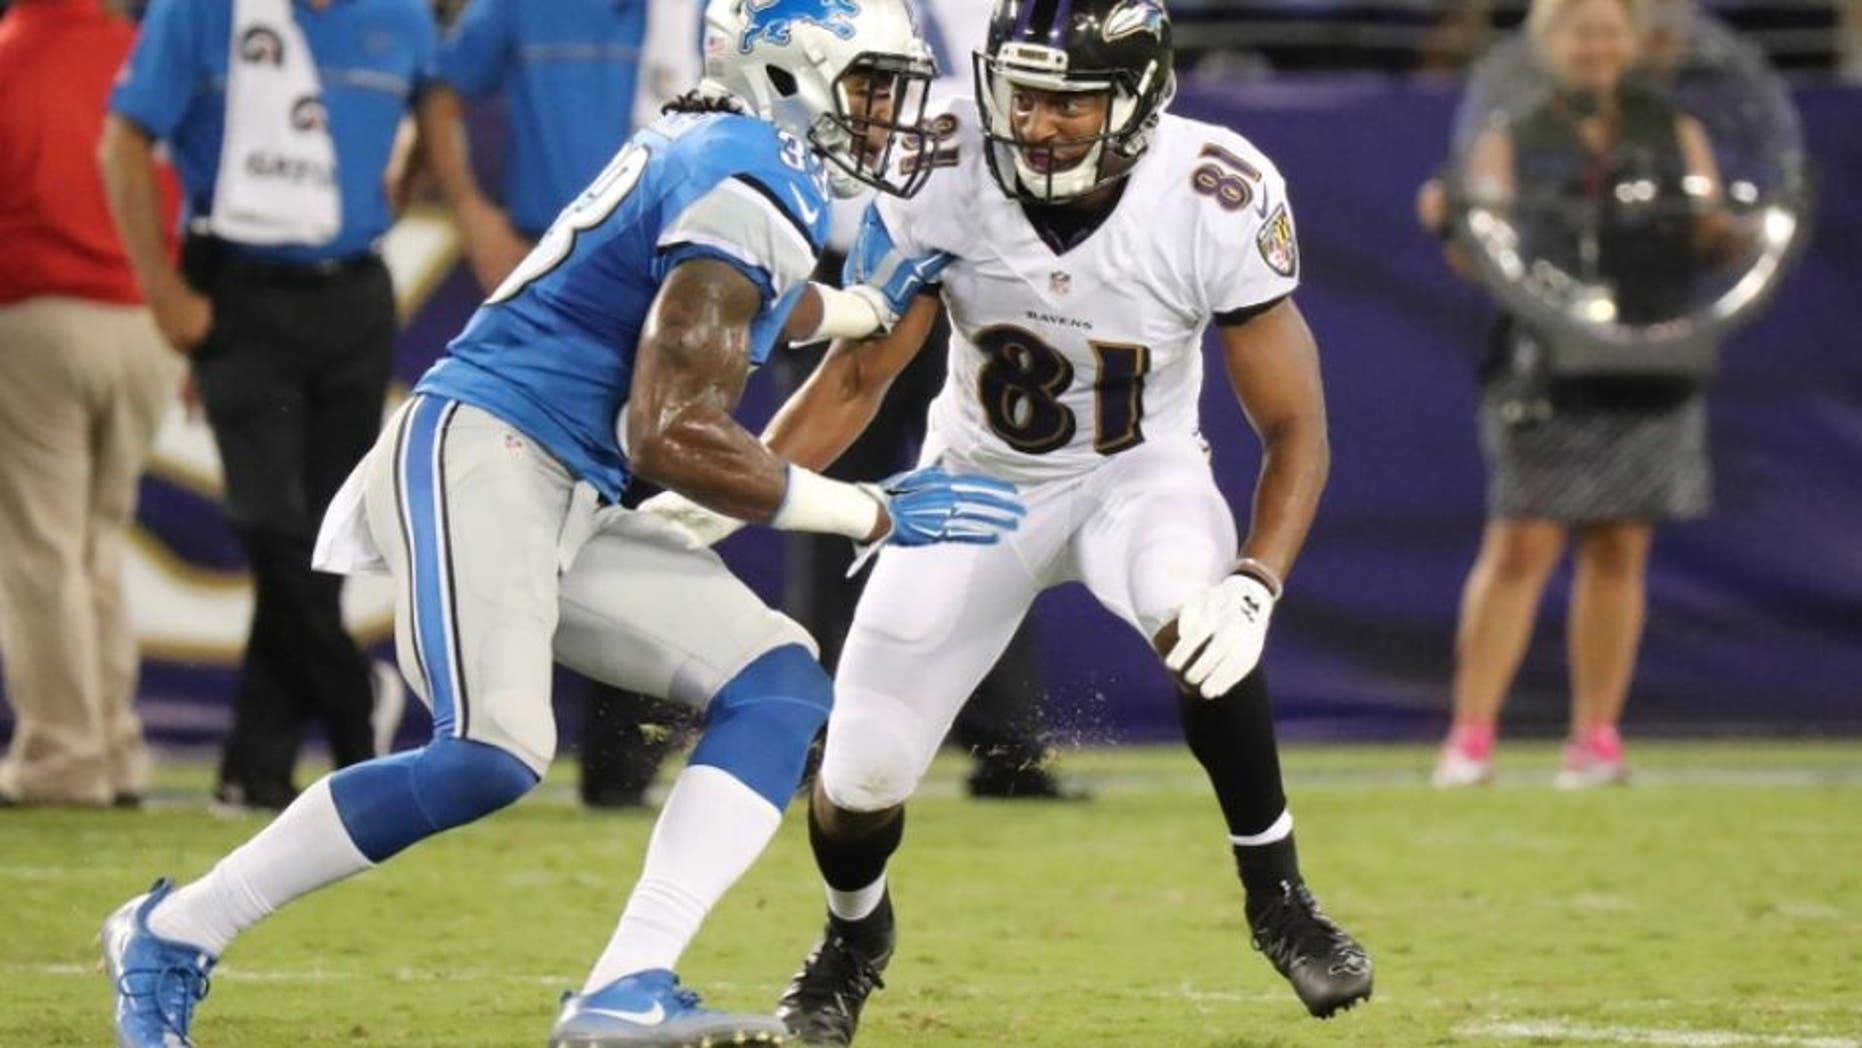 Aug 27, 2016; Baltimore, MD, USA; Baltimore Ravens wide receiver Keenan Reynolds (81) blocks Detroit Lions cornerback Alex Carter (33) at M&T Bank Stadium. Mandatory Credit: Mitch Stringer-USA TODAY Sports